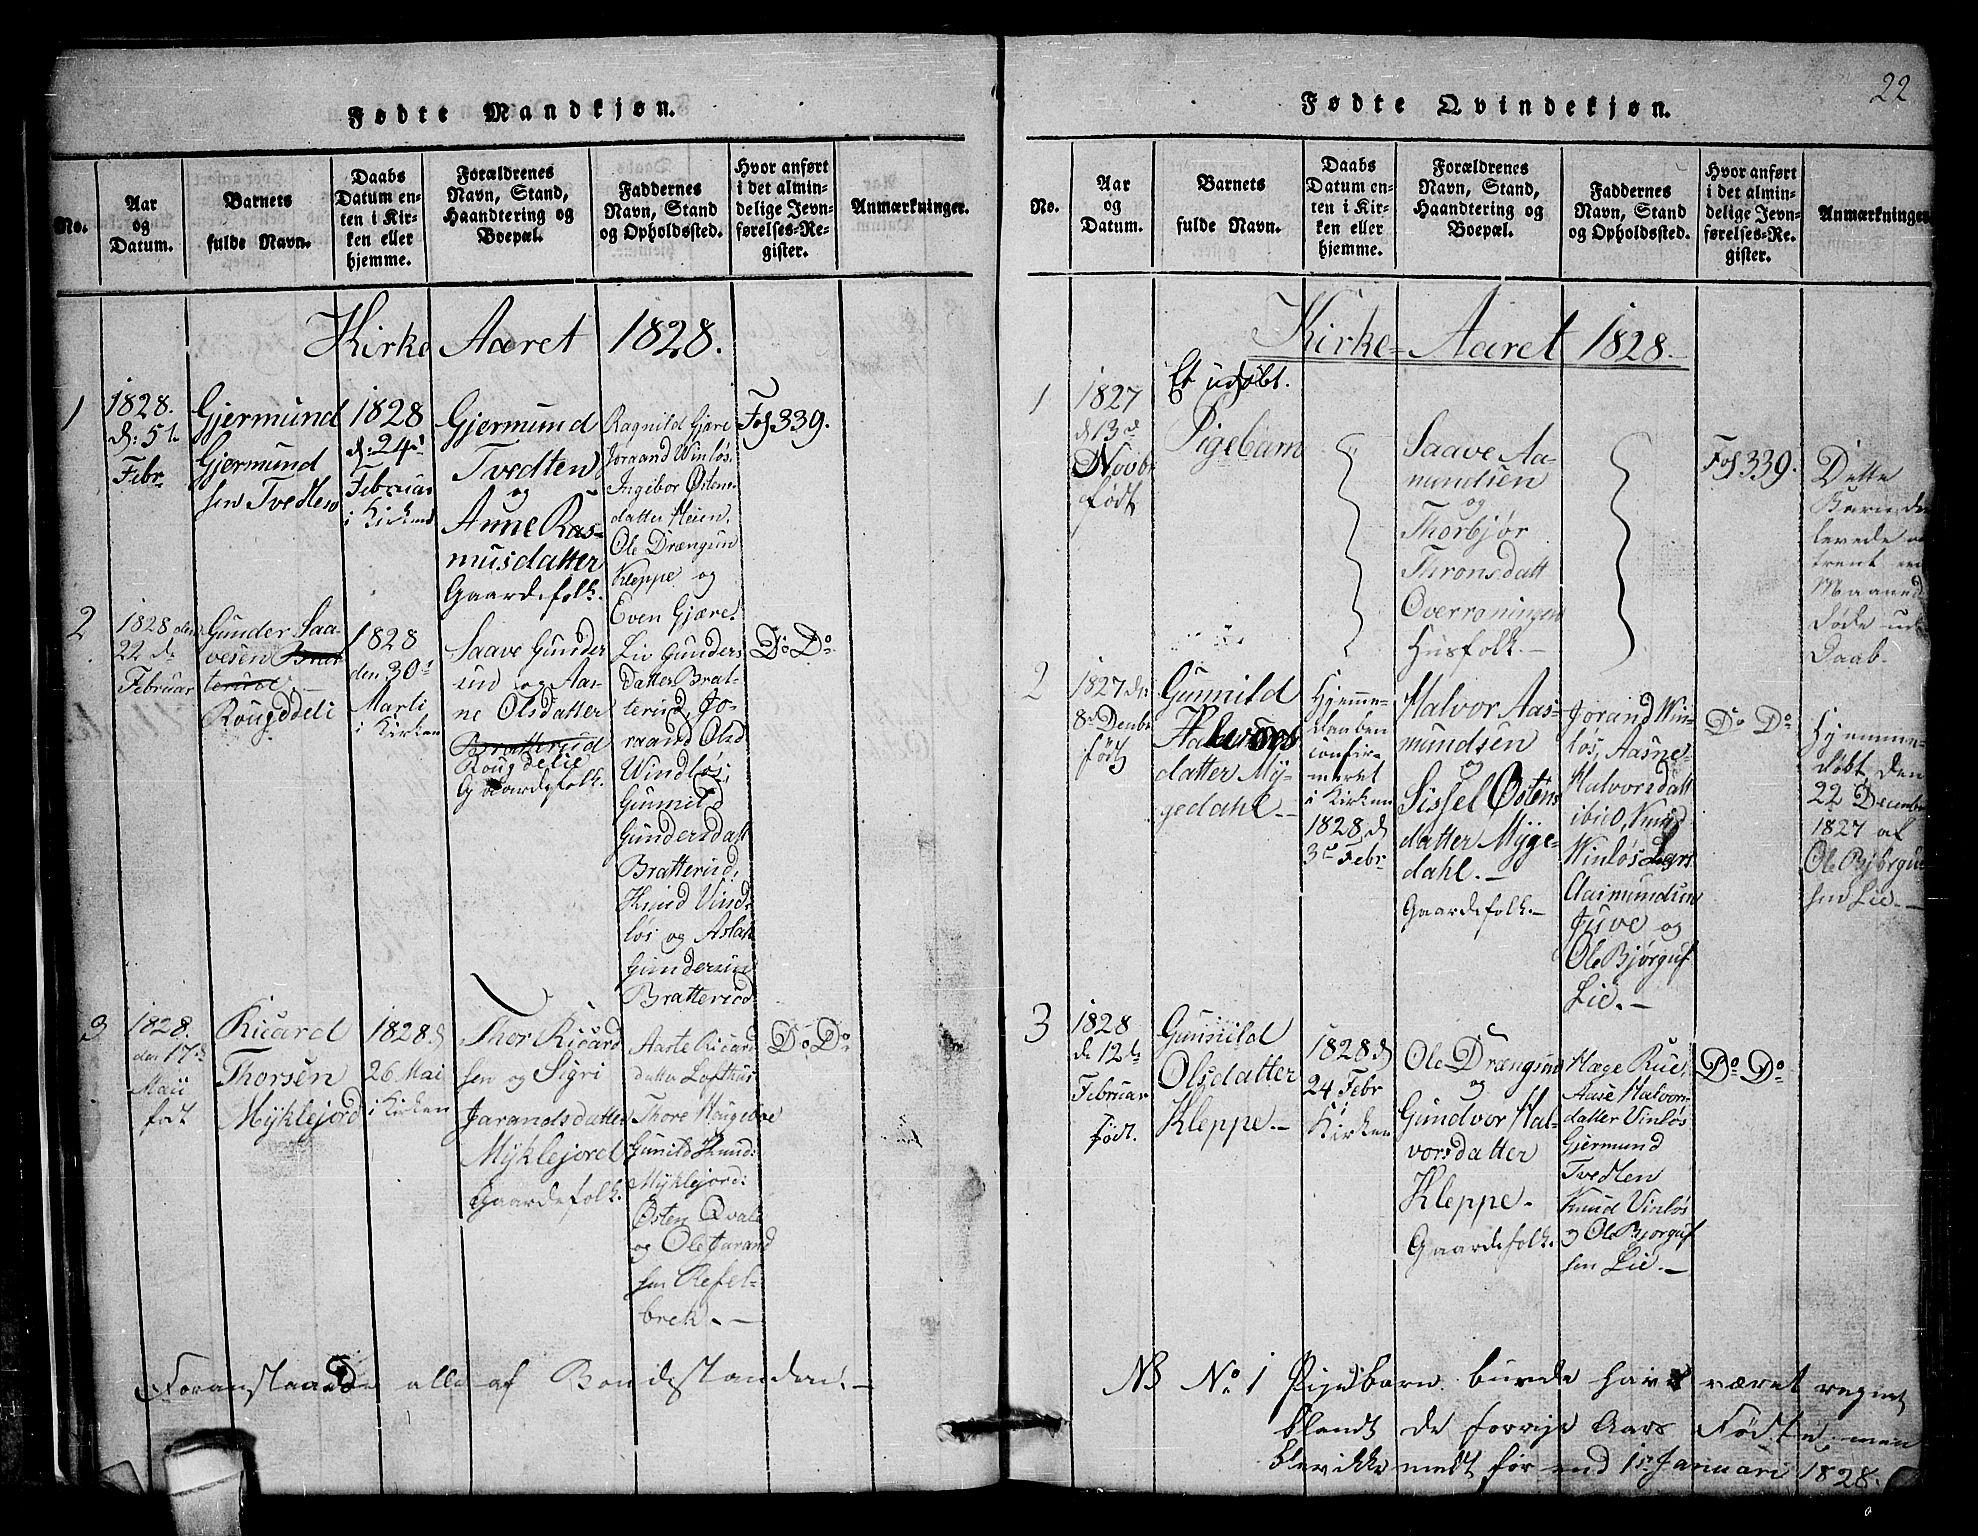 SAKO, Lårdal kirkebøker, G/Gb/L0001: Klokkerbok nr. II 1, 1815-1865, s. 22